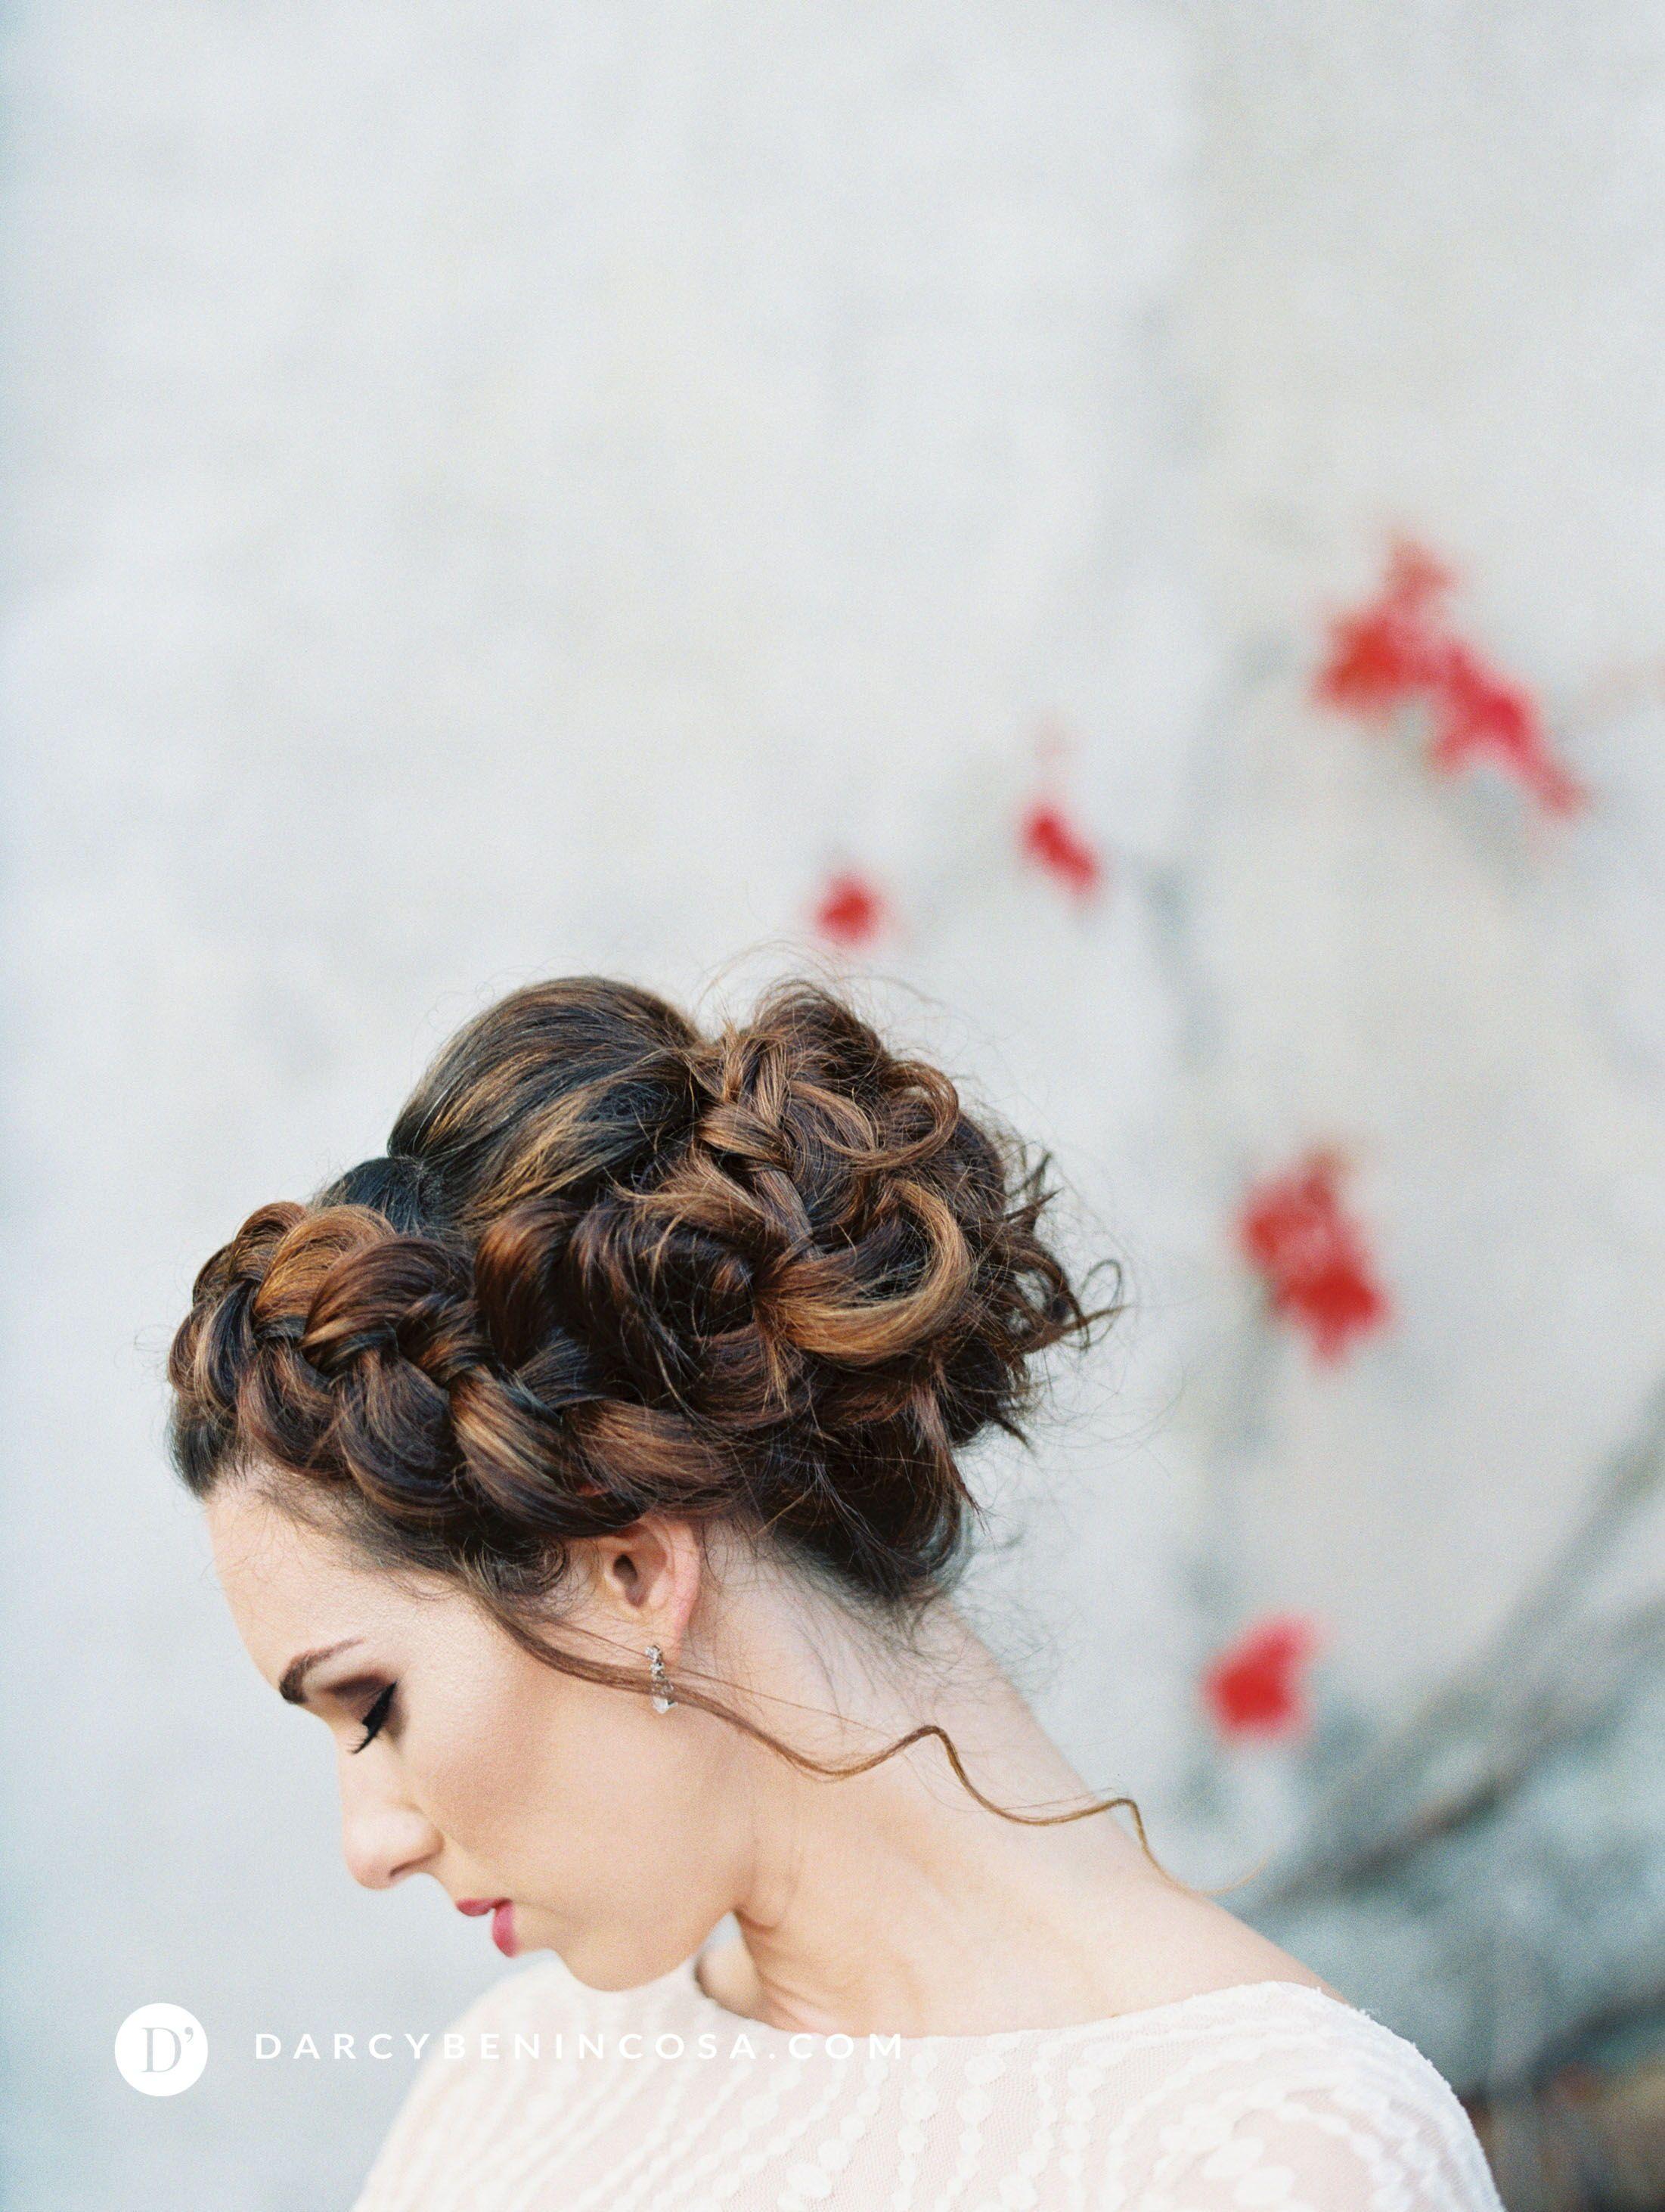 ireland wedding photography, venues, locations, elopement